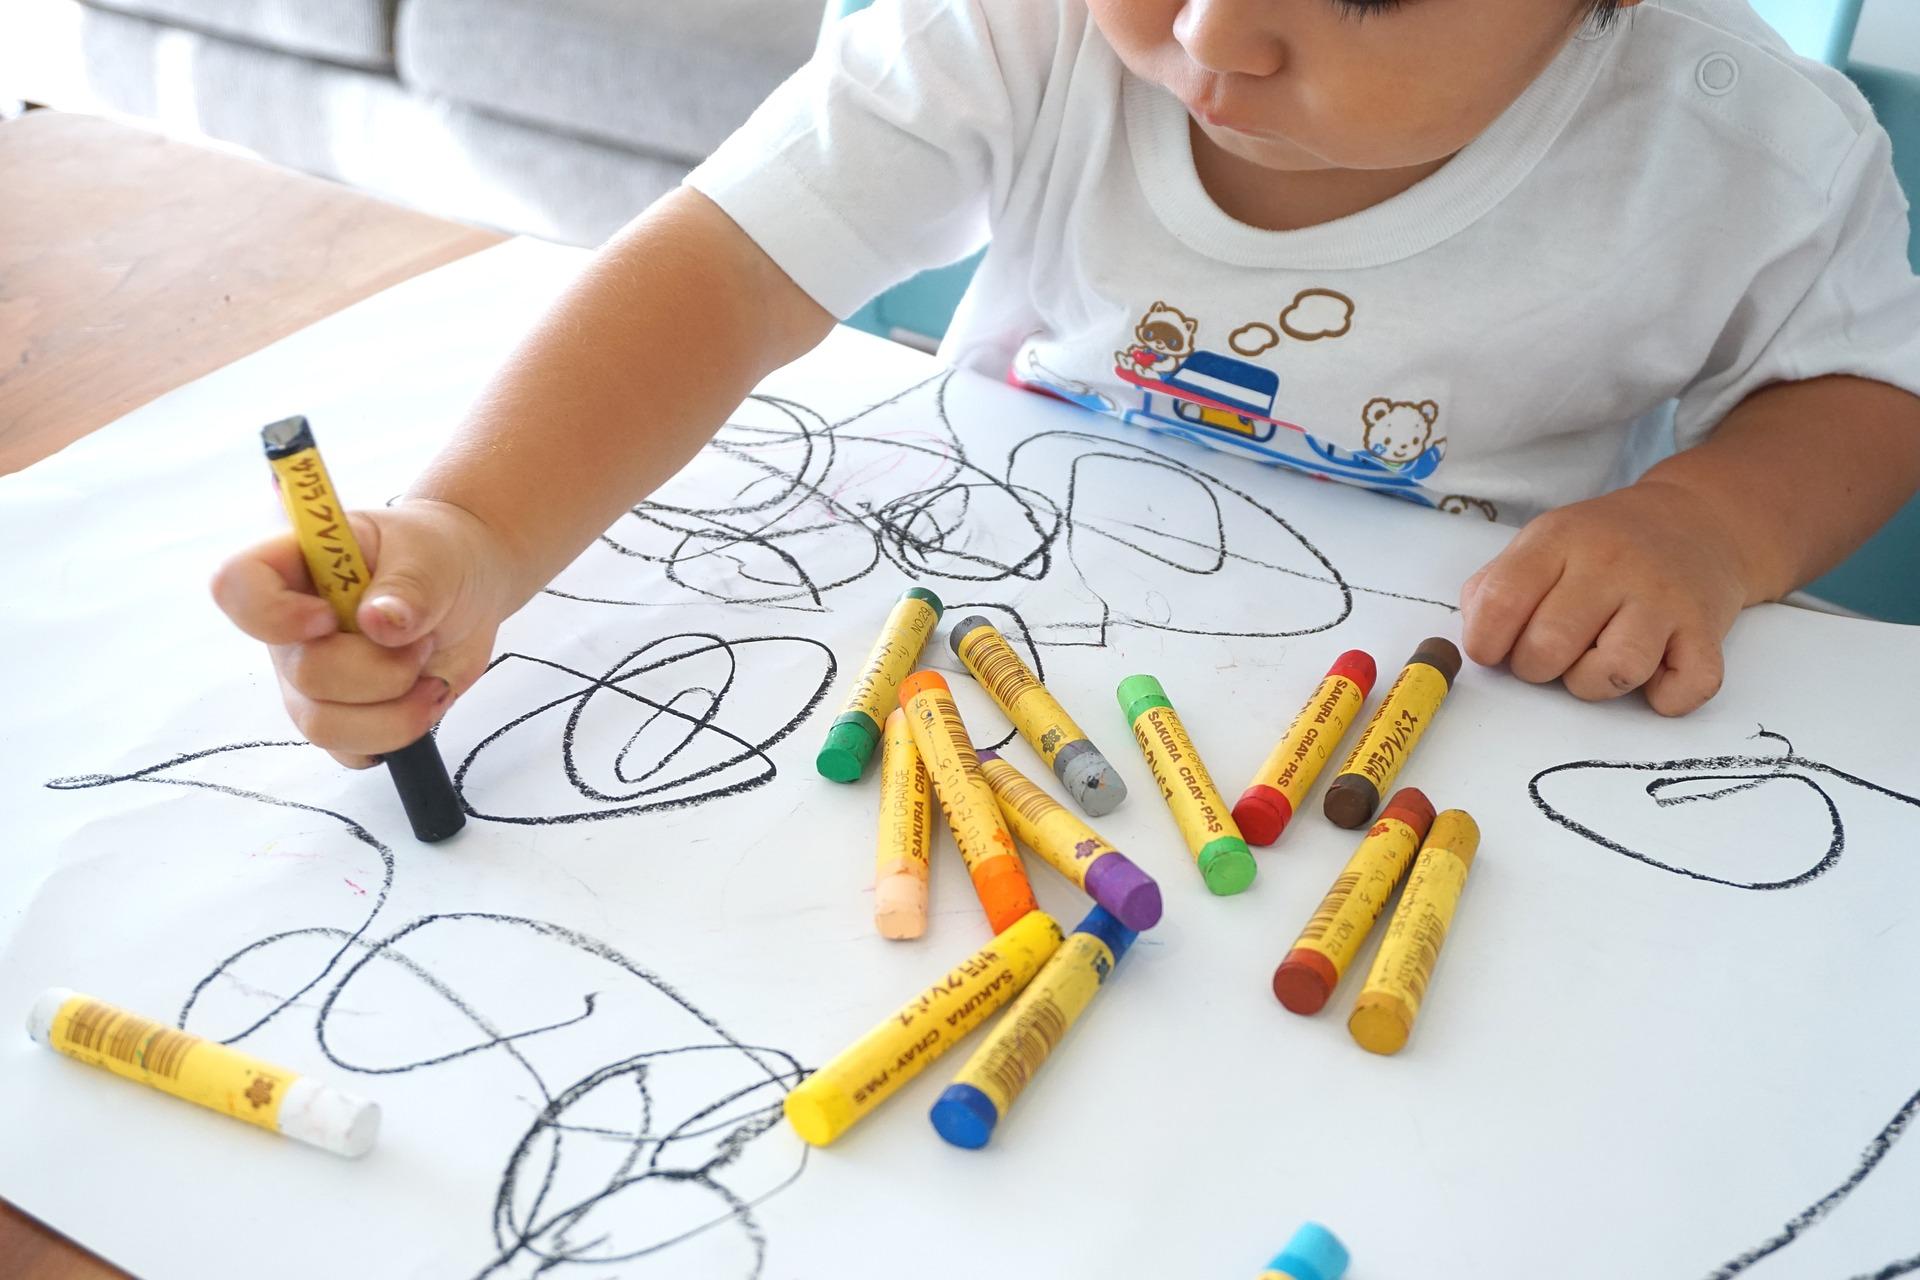 Child crayoning